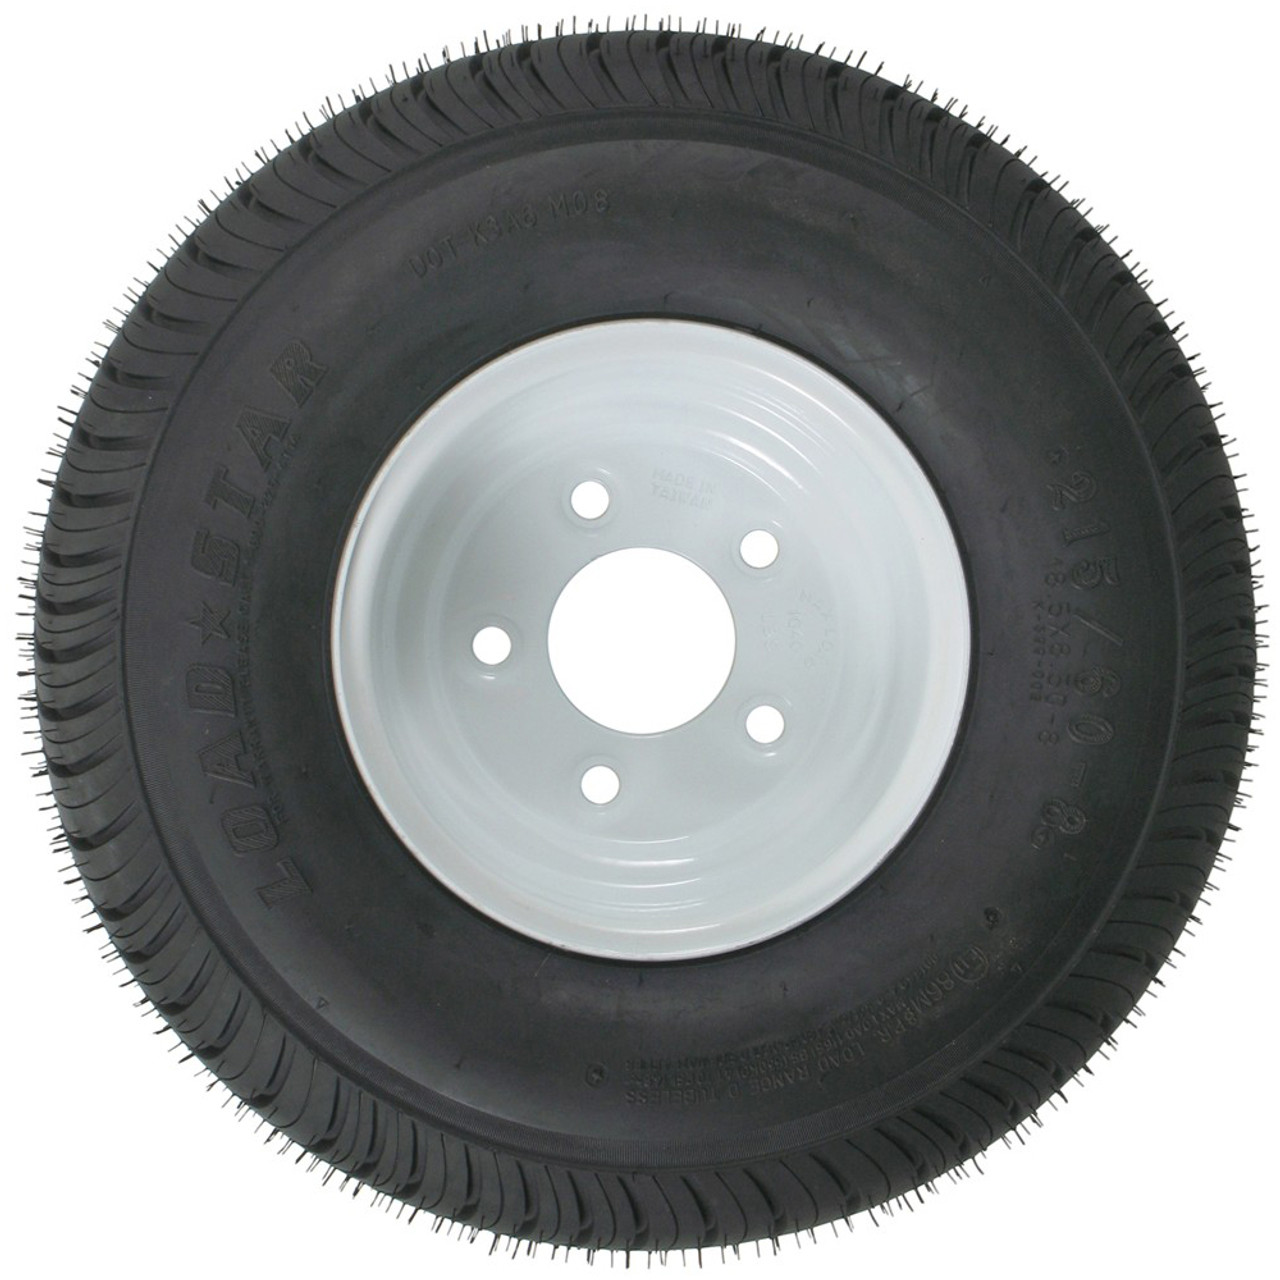 ATW30060 & ATW30155 Dolly Wheel & Tire